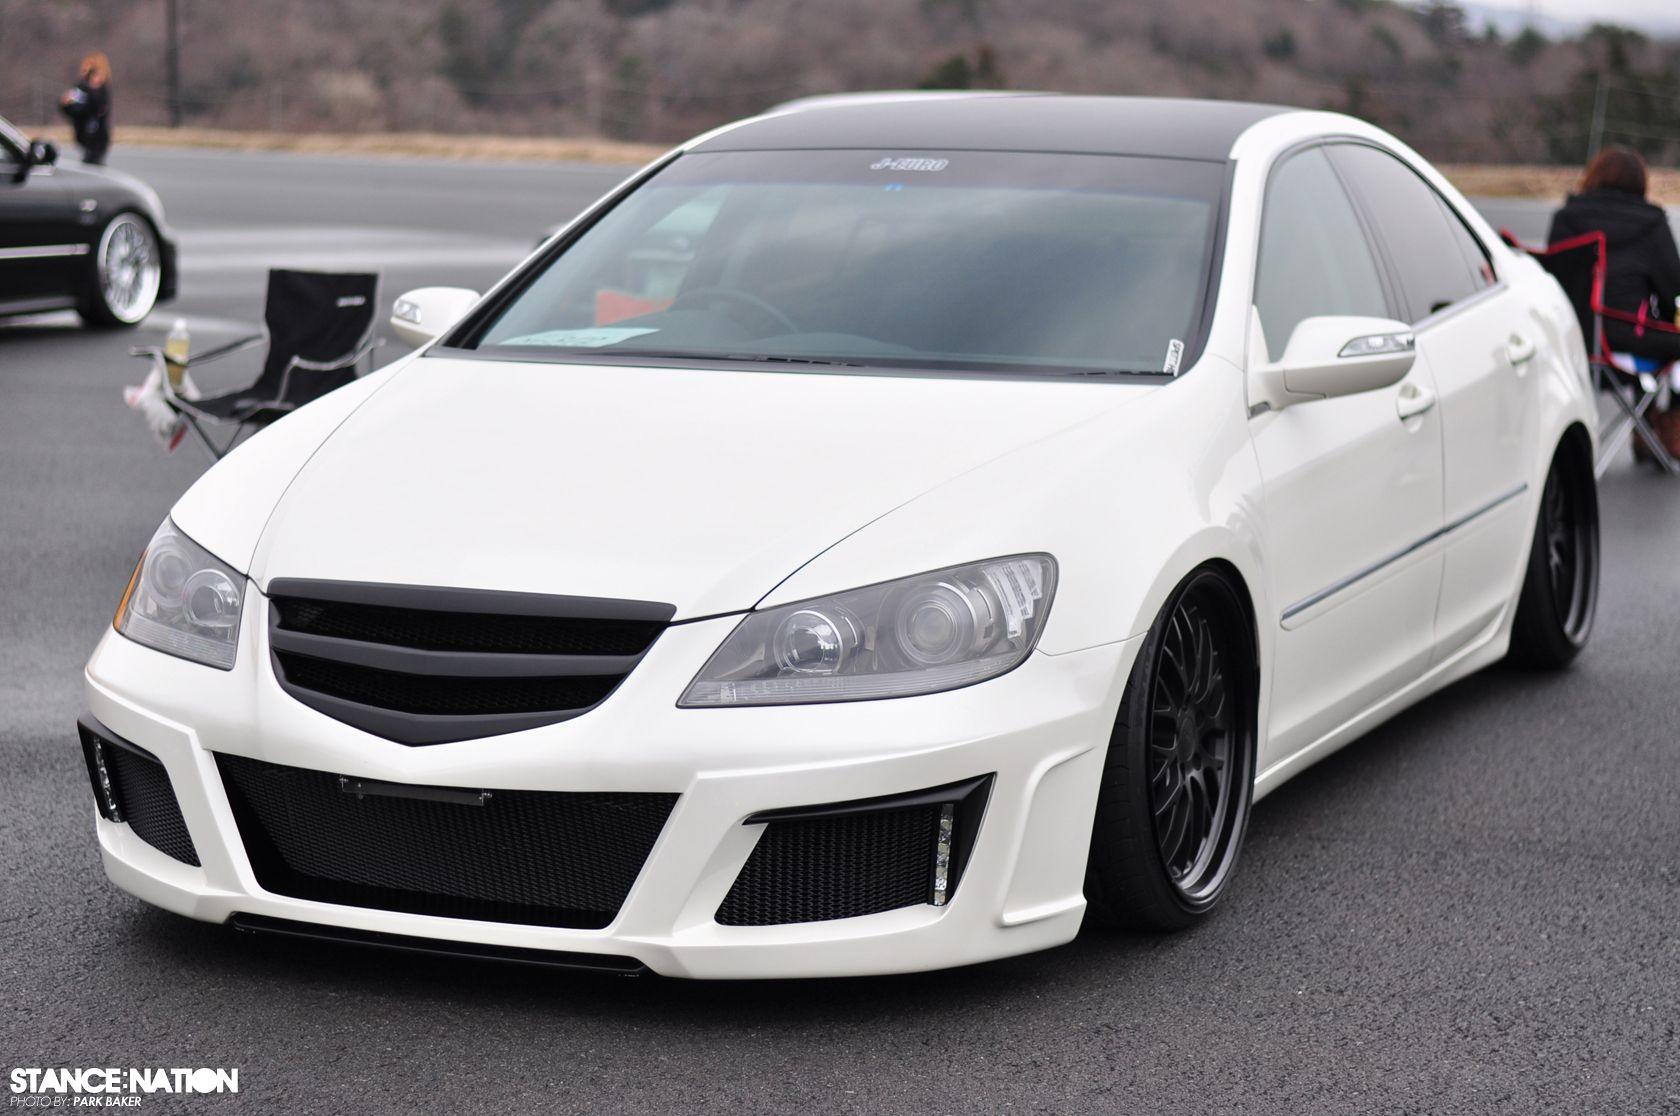 VI¶ KB1 JDM   Honda legend, Honda, Acura